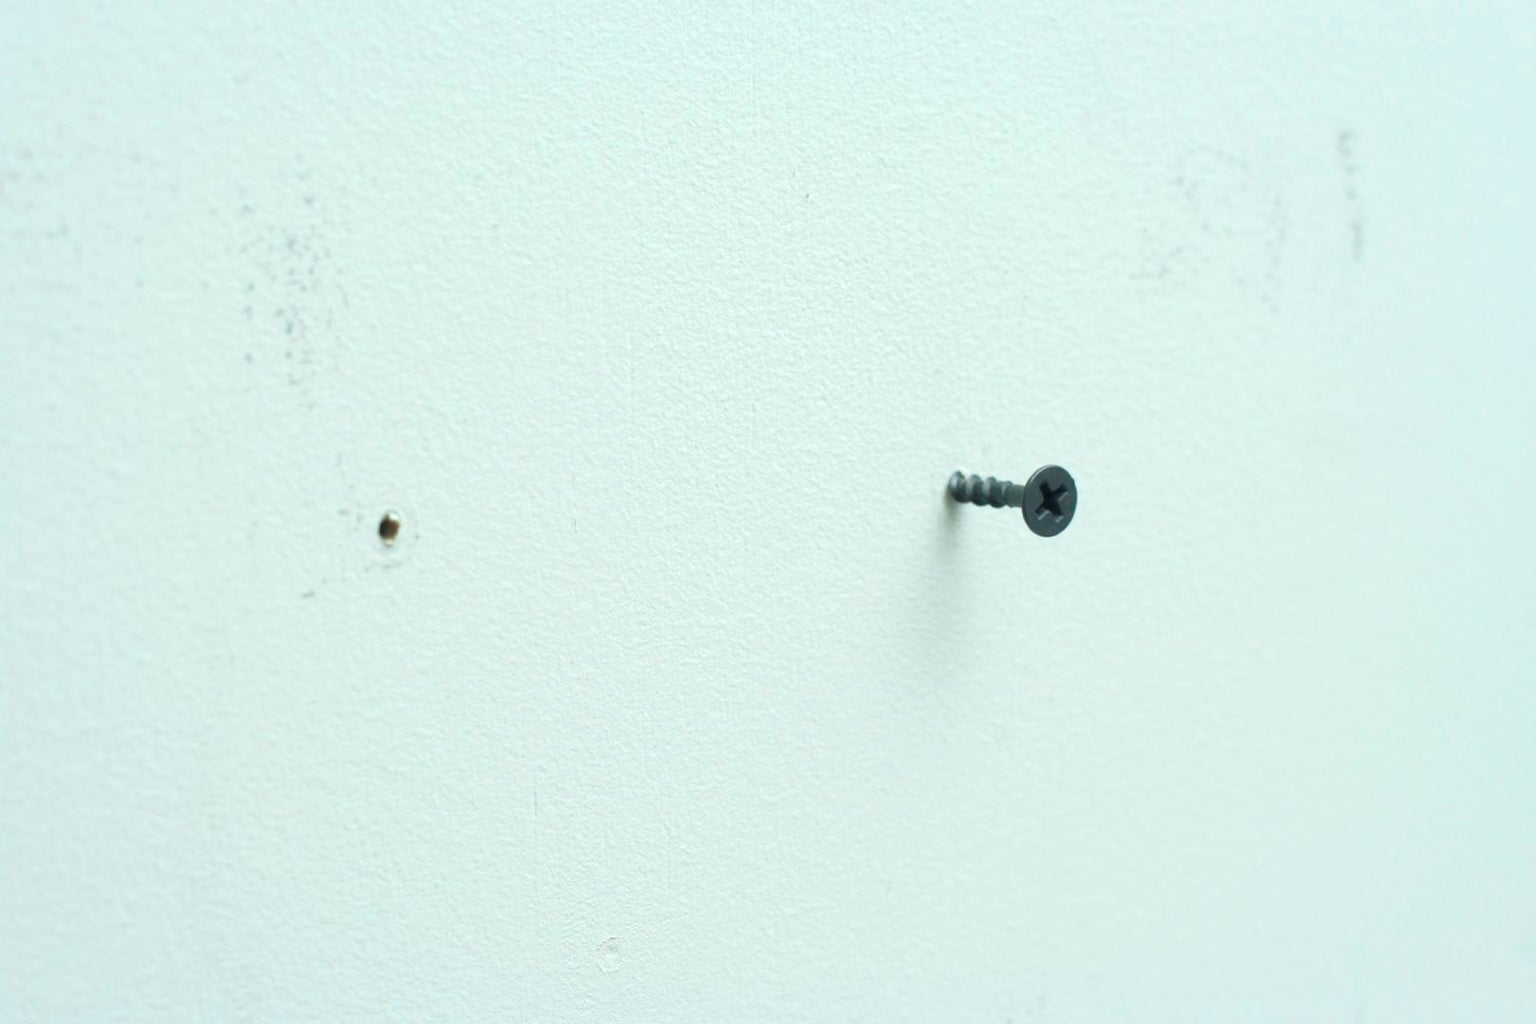 Patch a Screw Hole